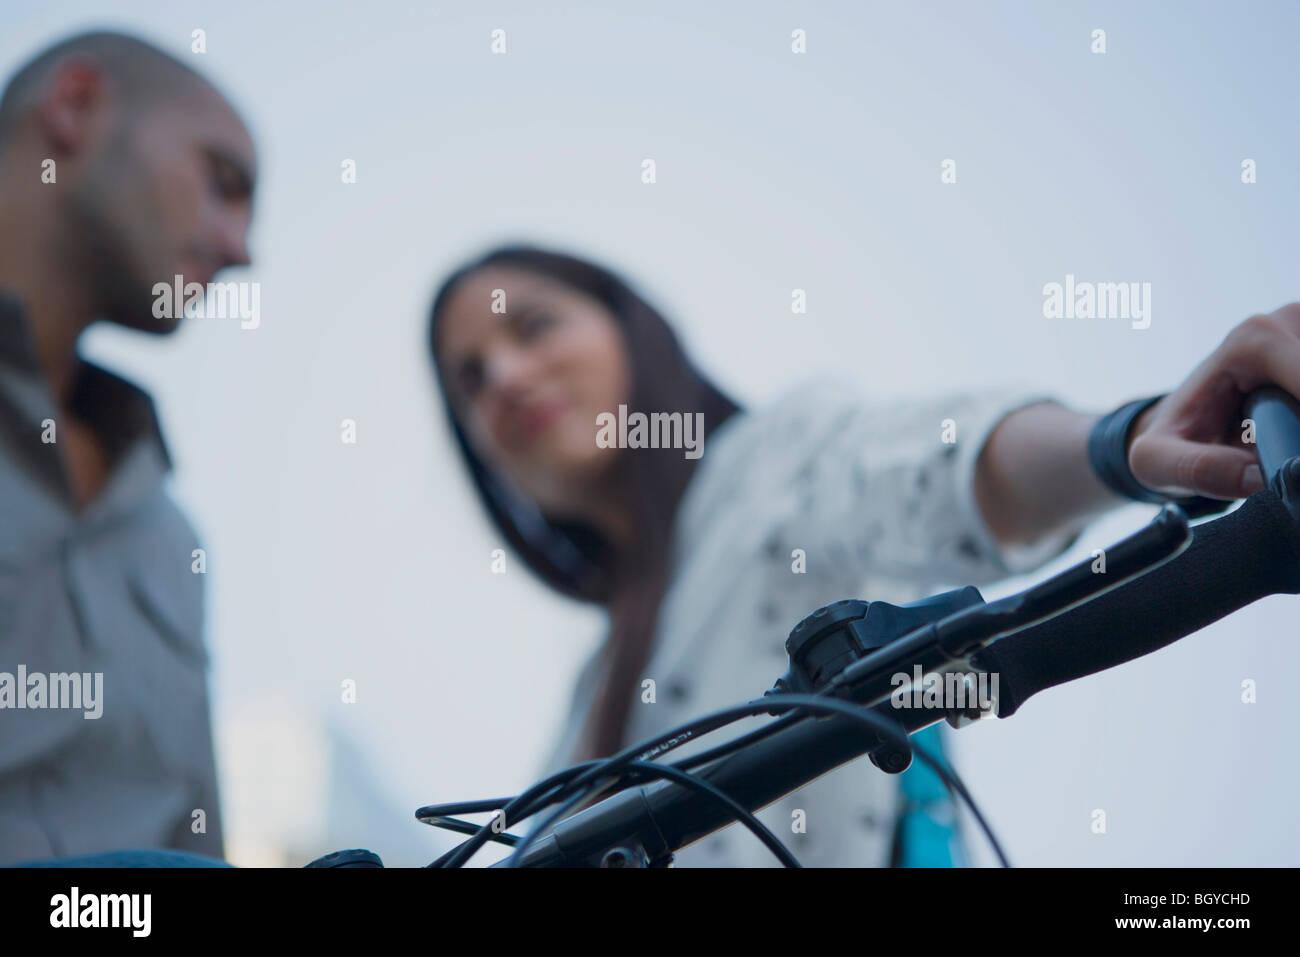 Man and woman having conversation, woman holding bike handlebar - Stock Image